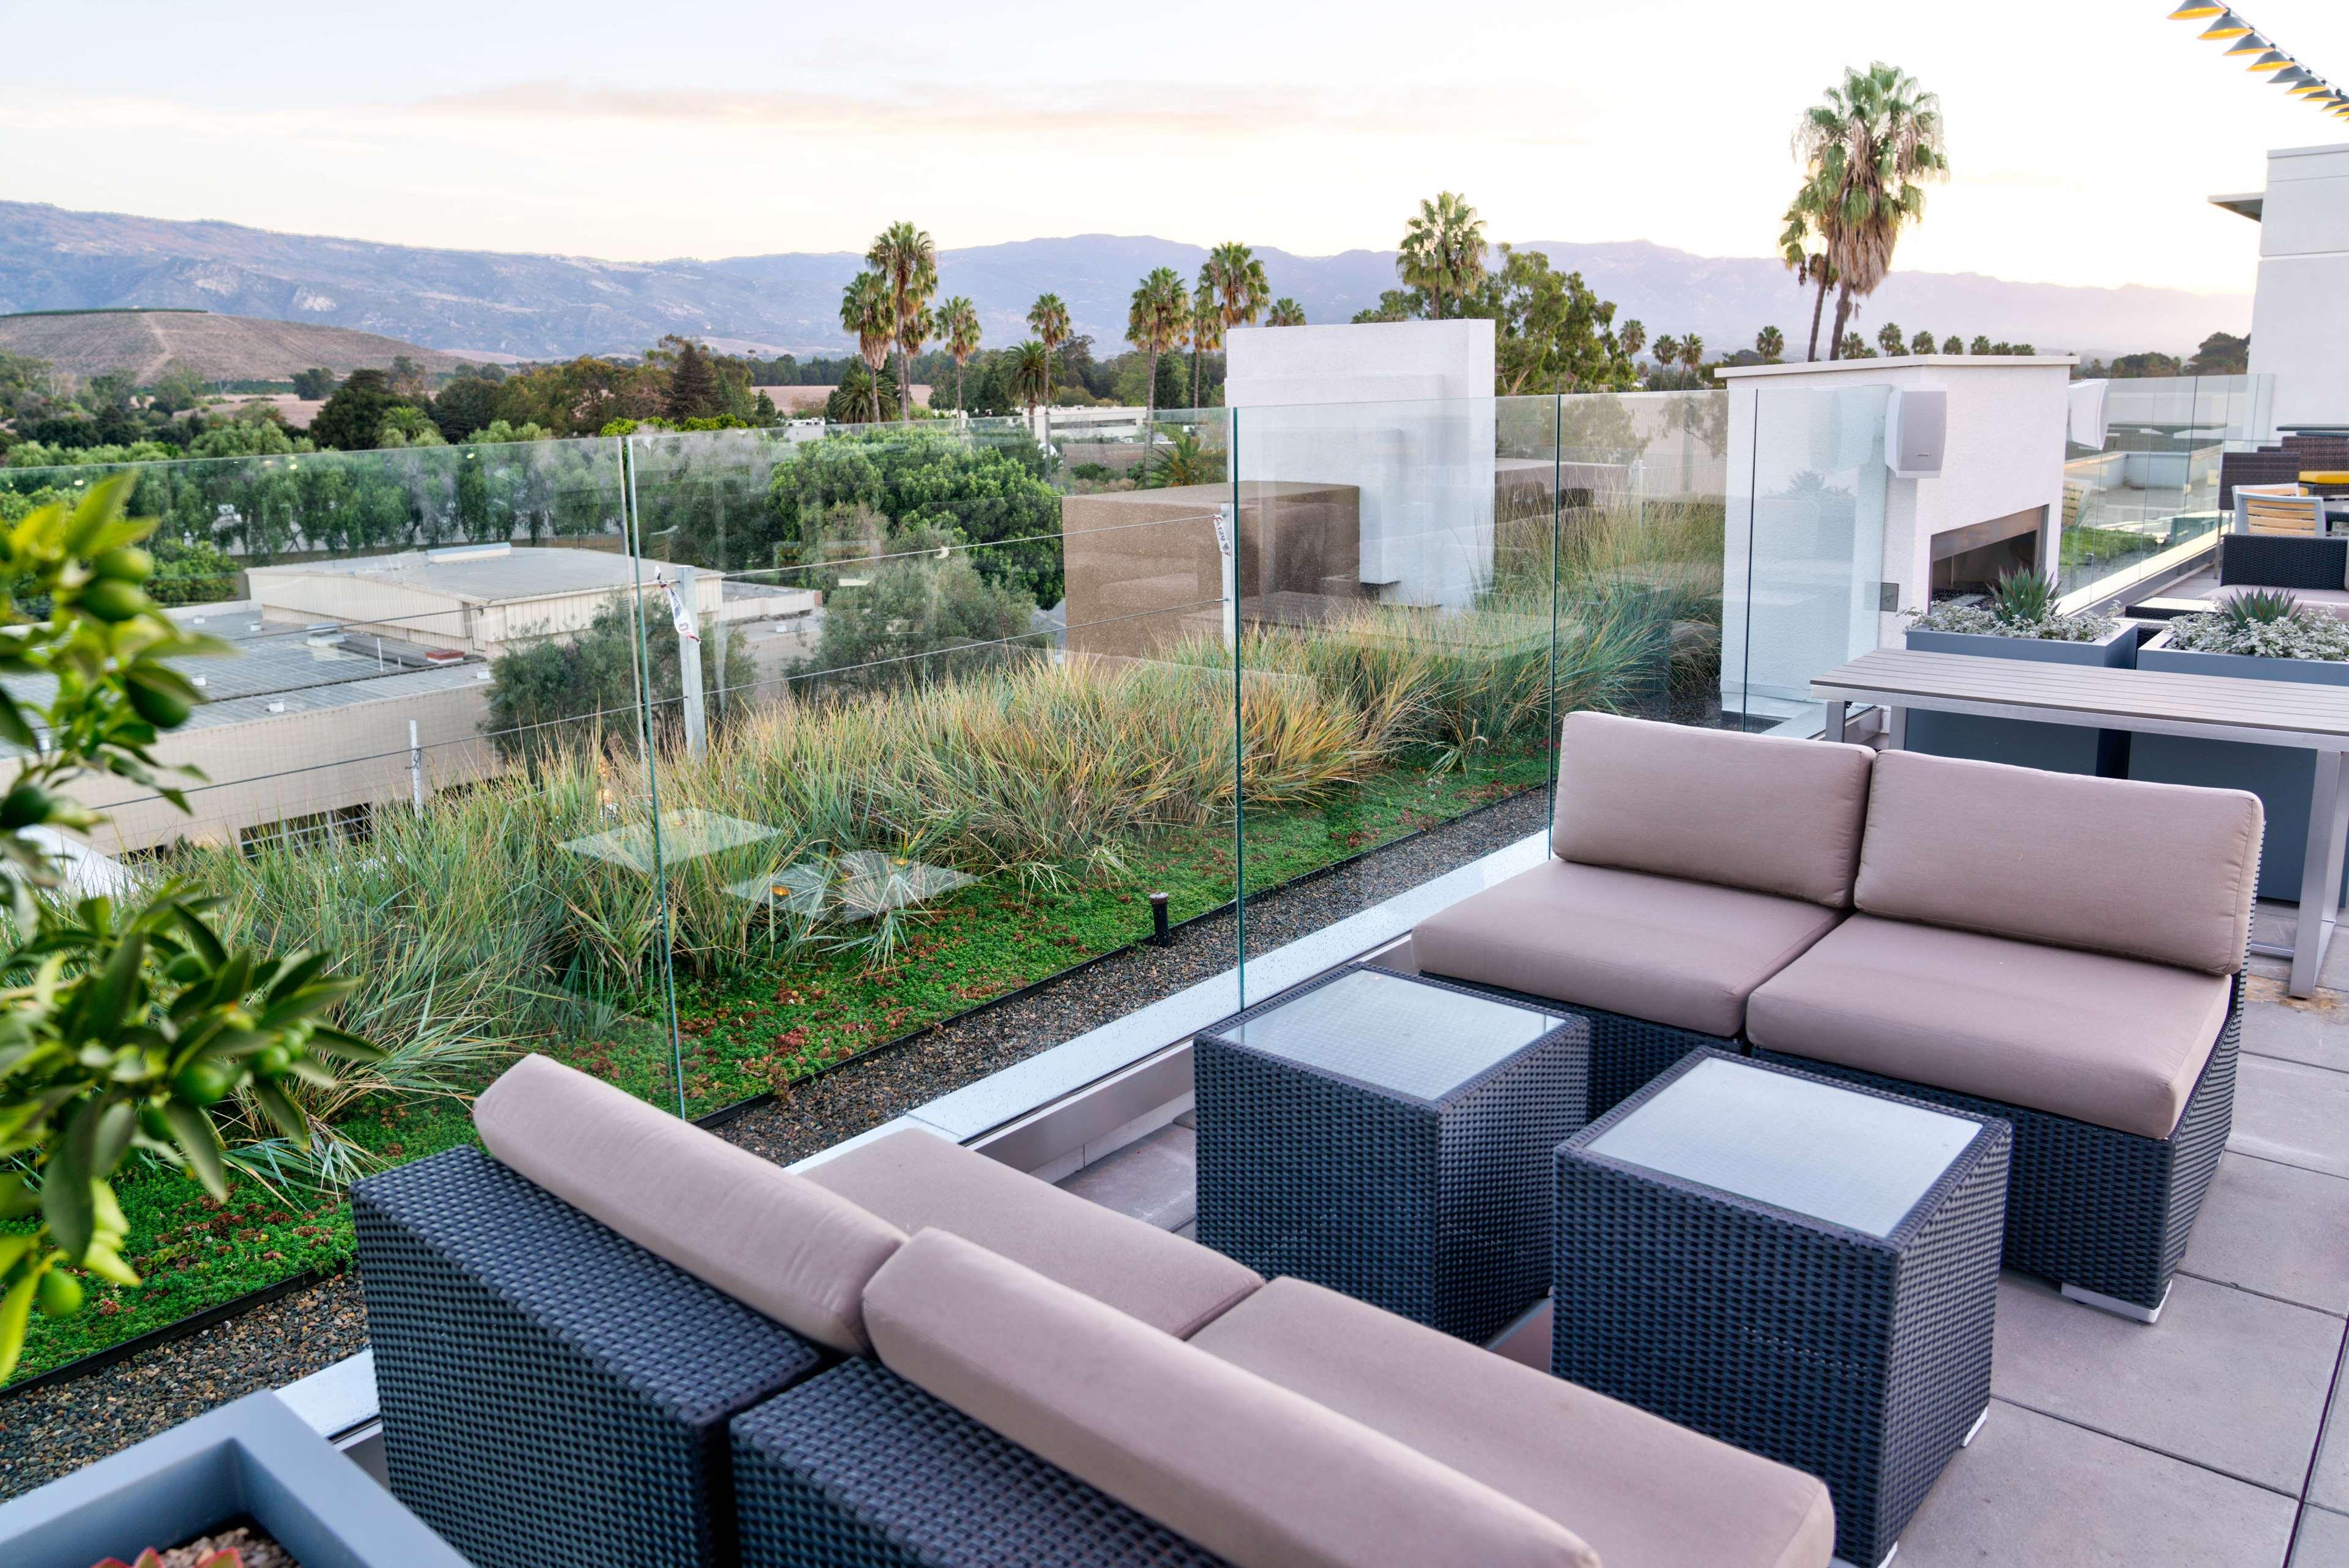 Hilton Garden Inn Santa Barbara/Goleta image 5